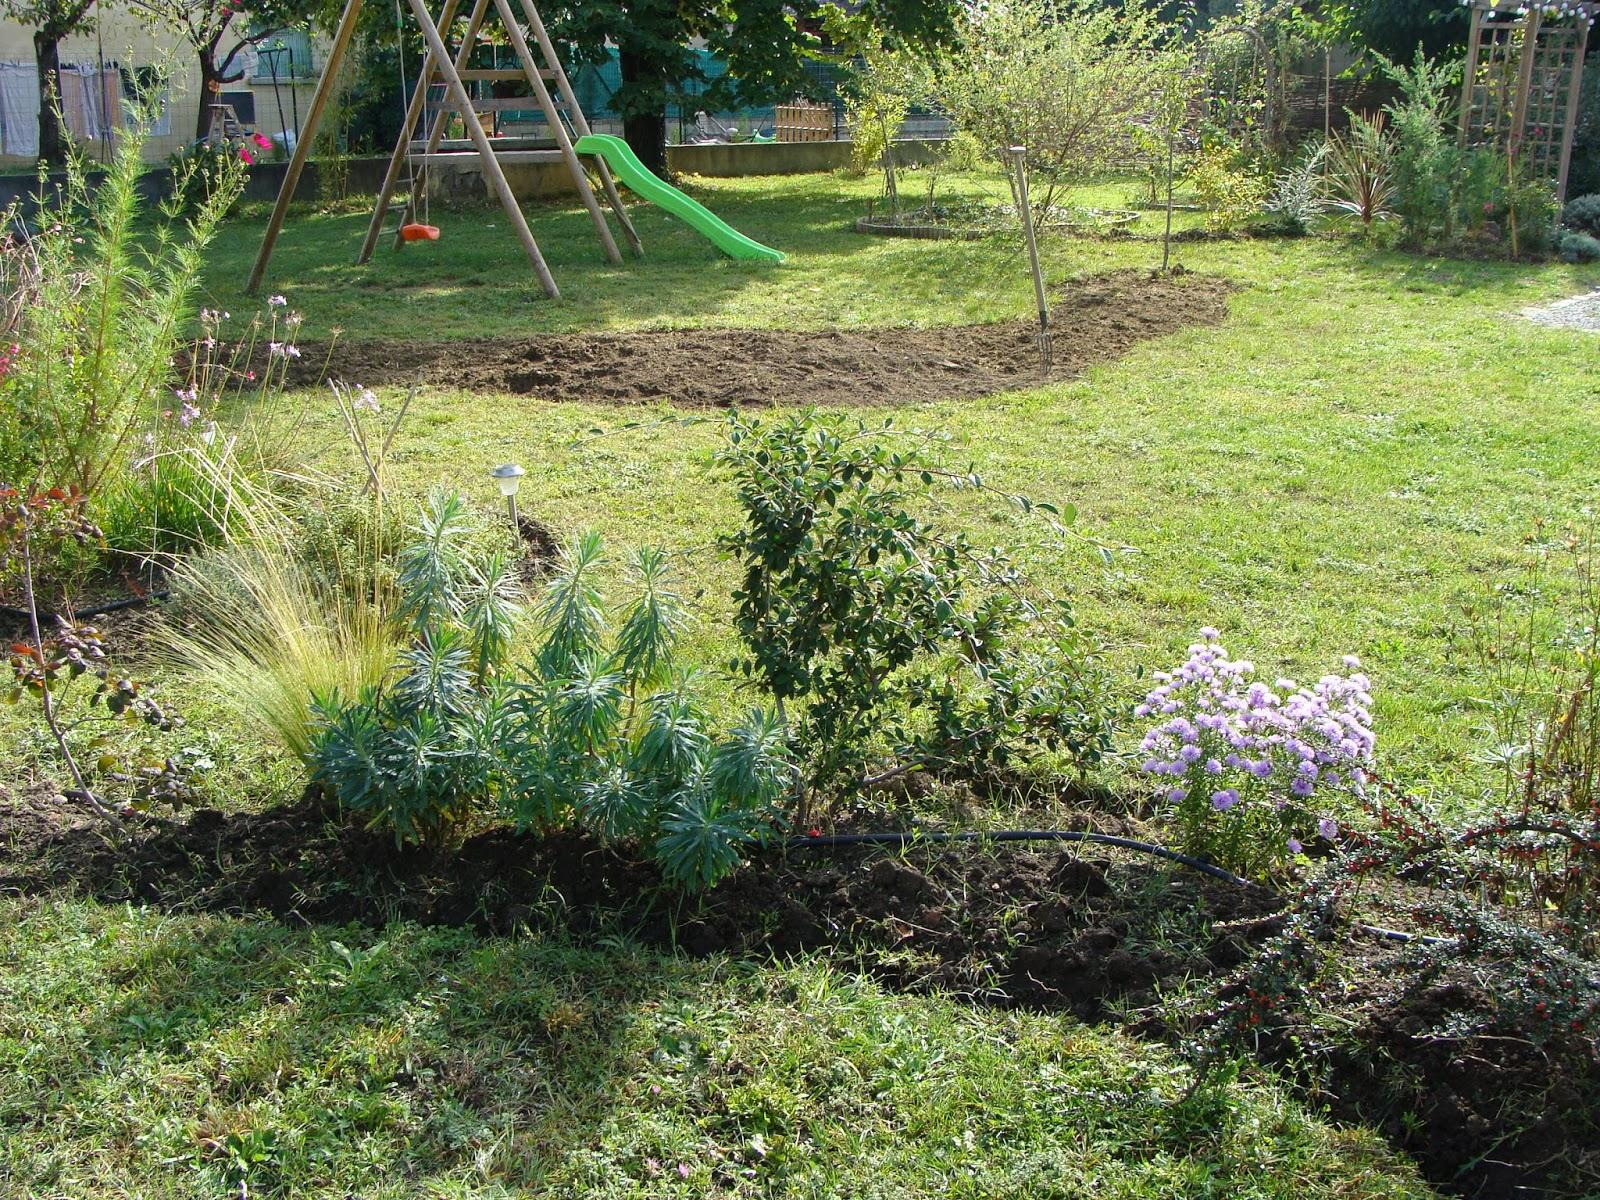 Jardine et ris chose promise chose due saison 2 for Jardin jardine